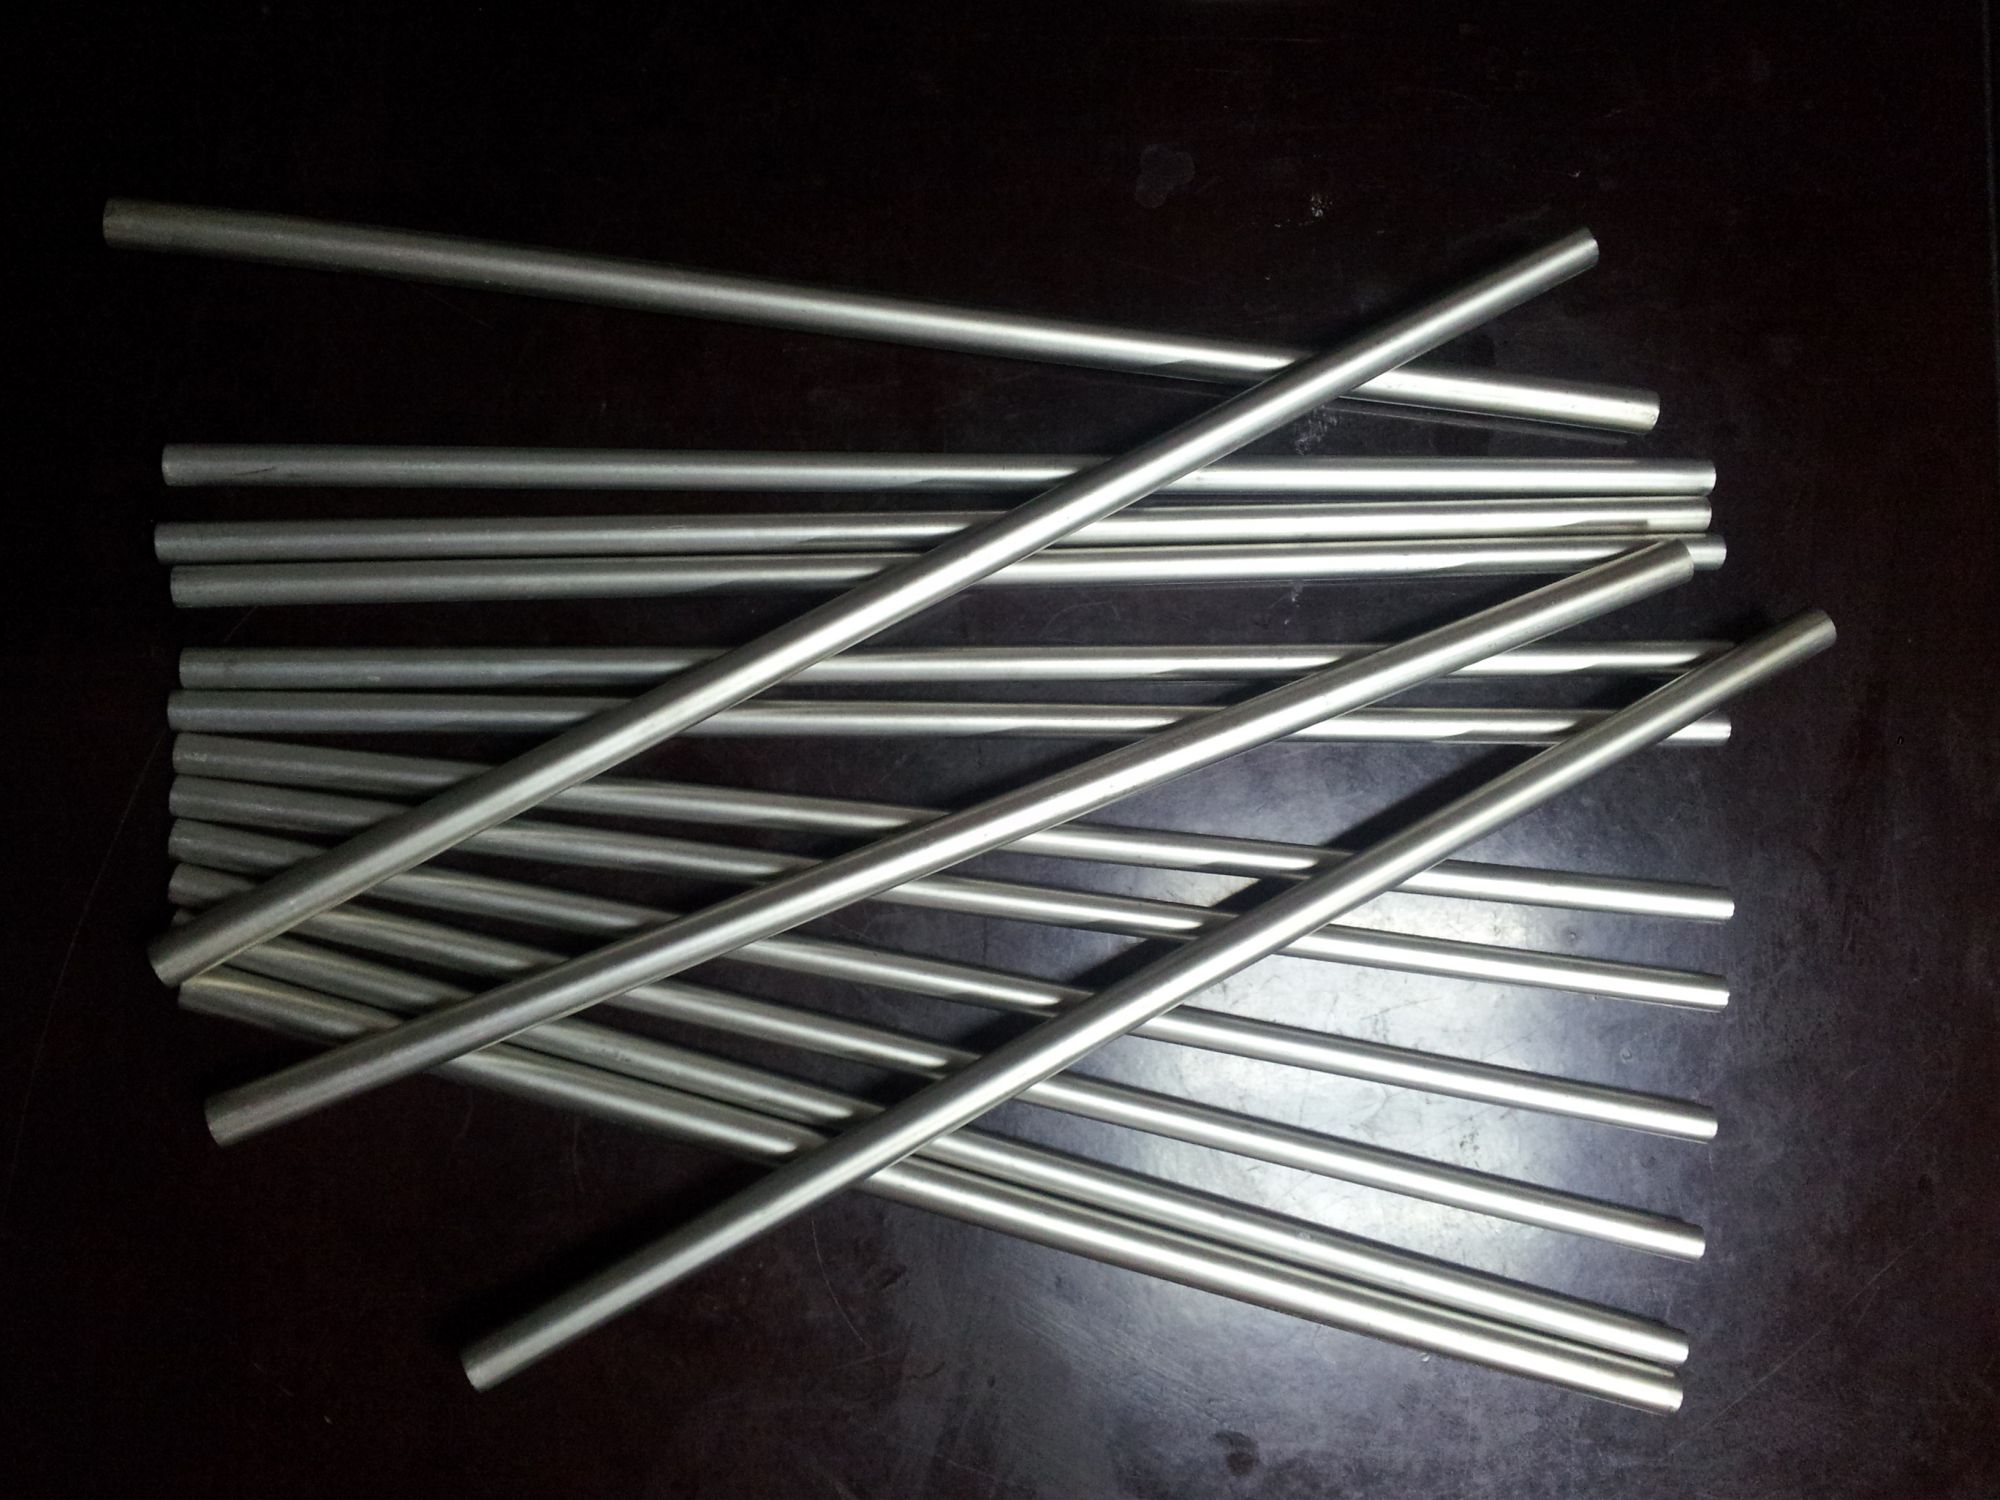 ASTM A276 310 round bar